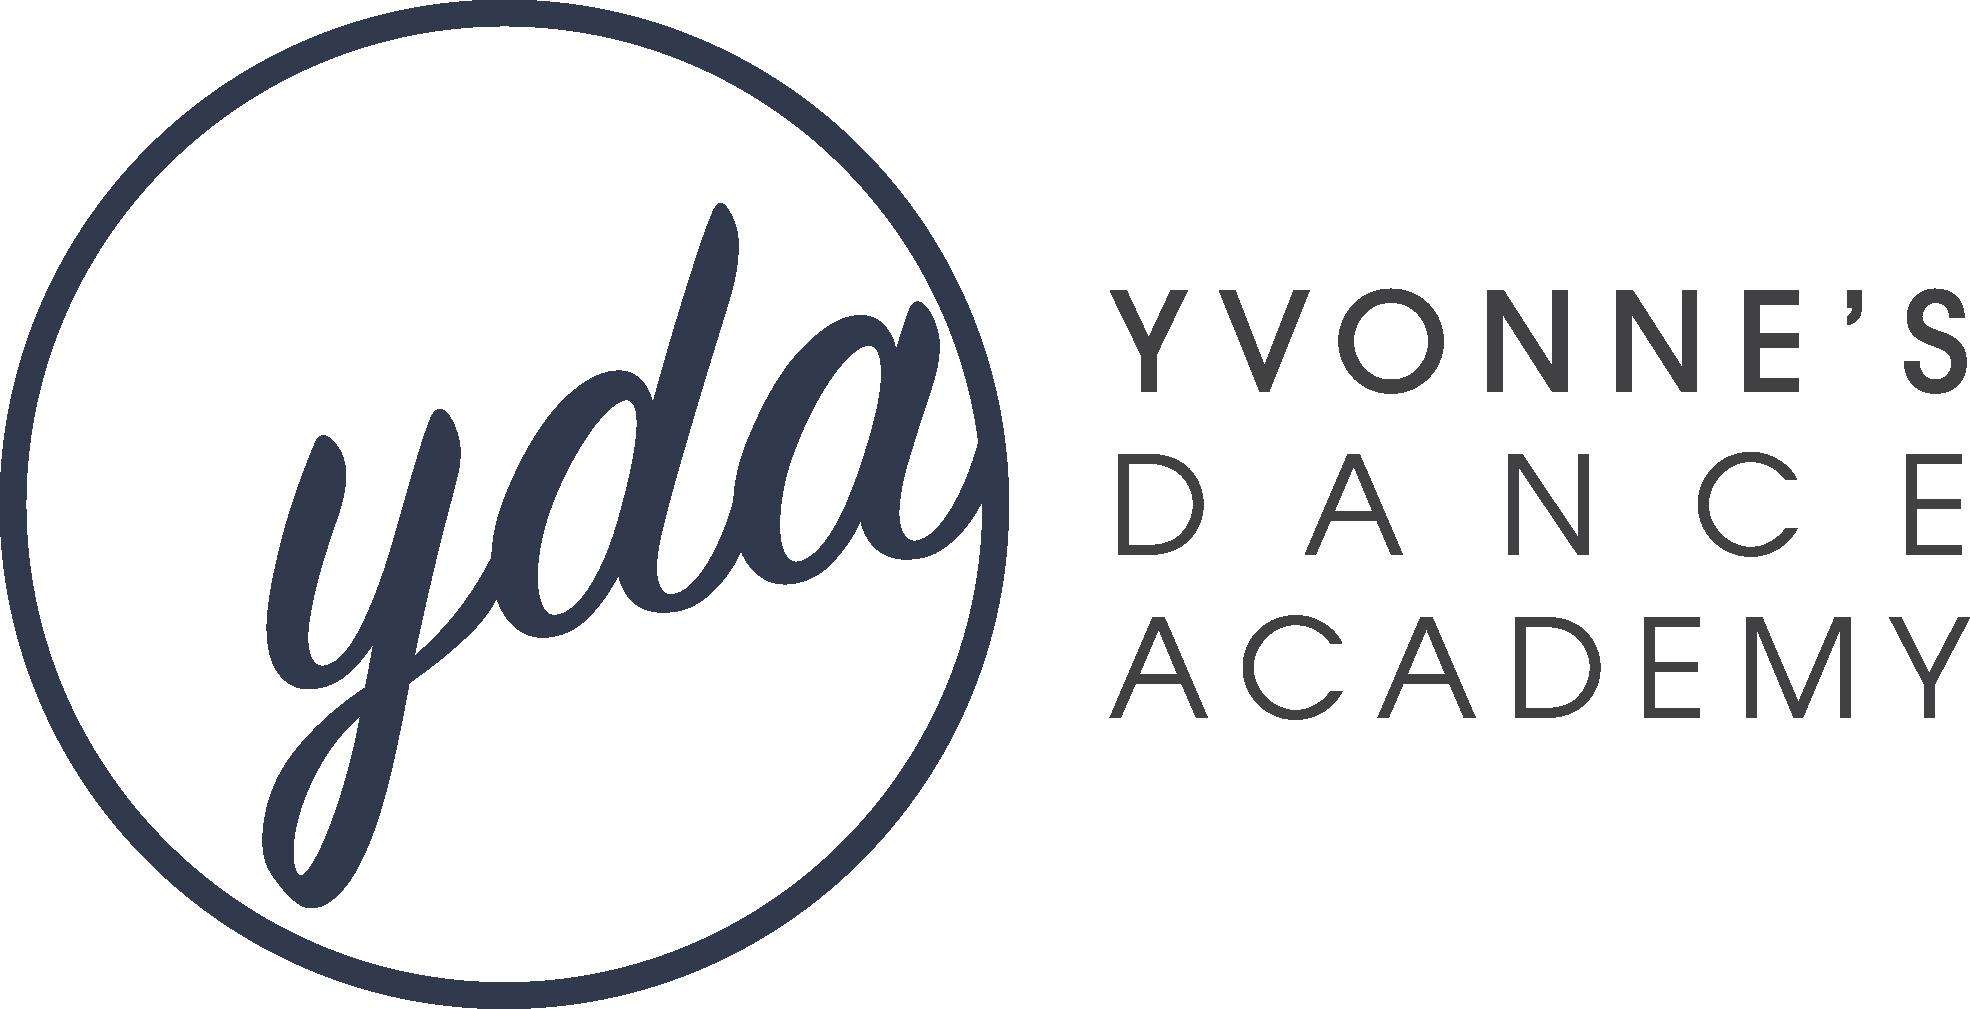 YDA | Yvonnes Dance Academy